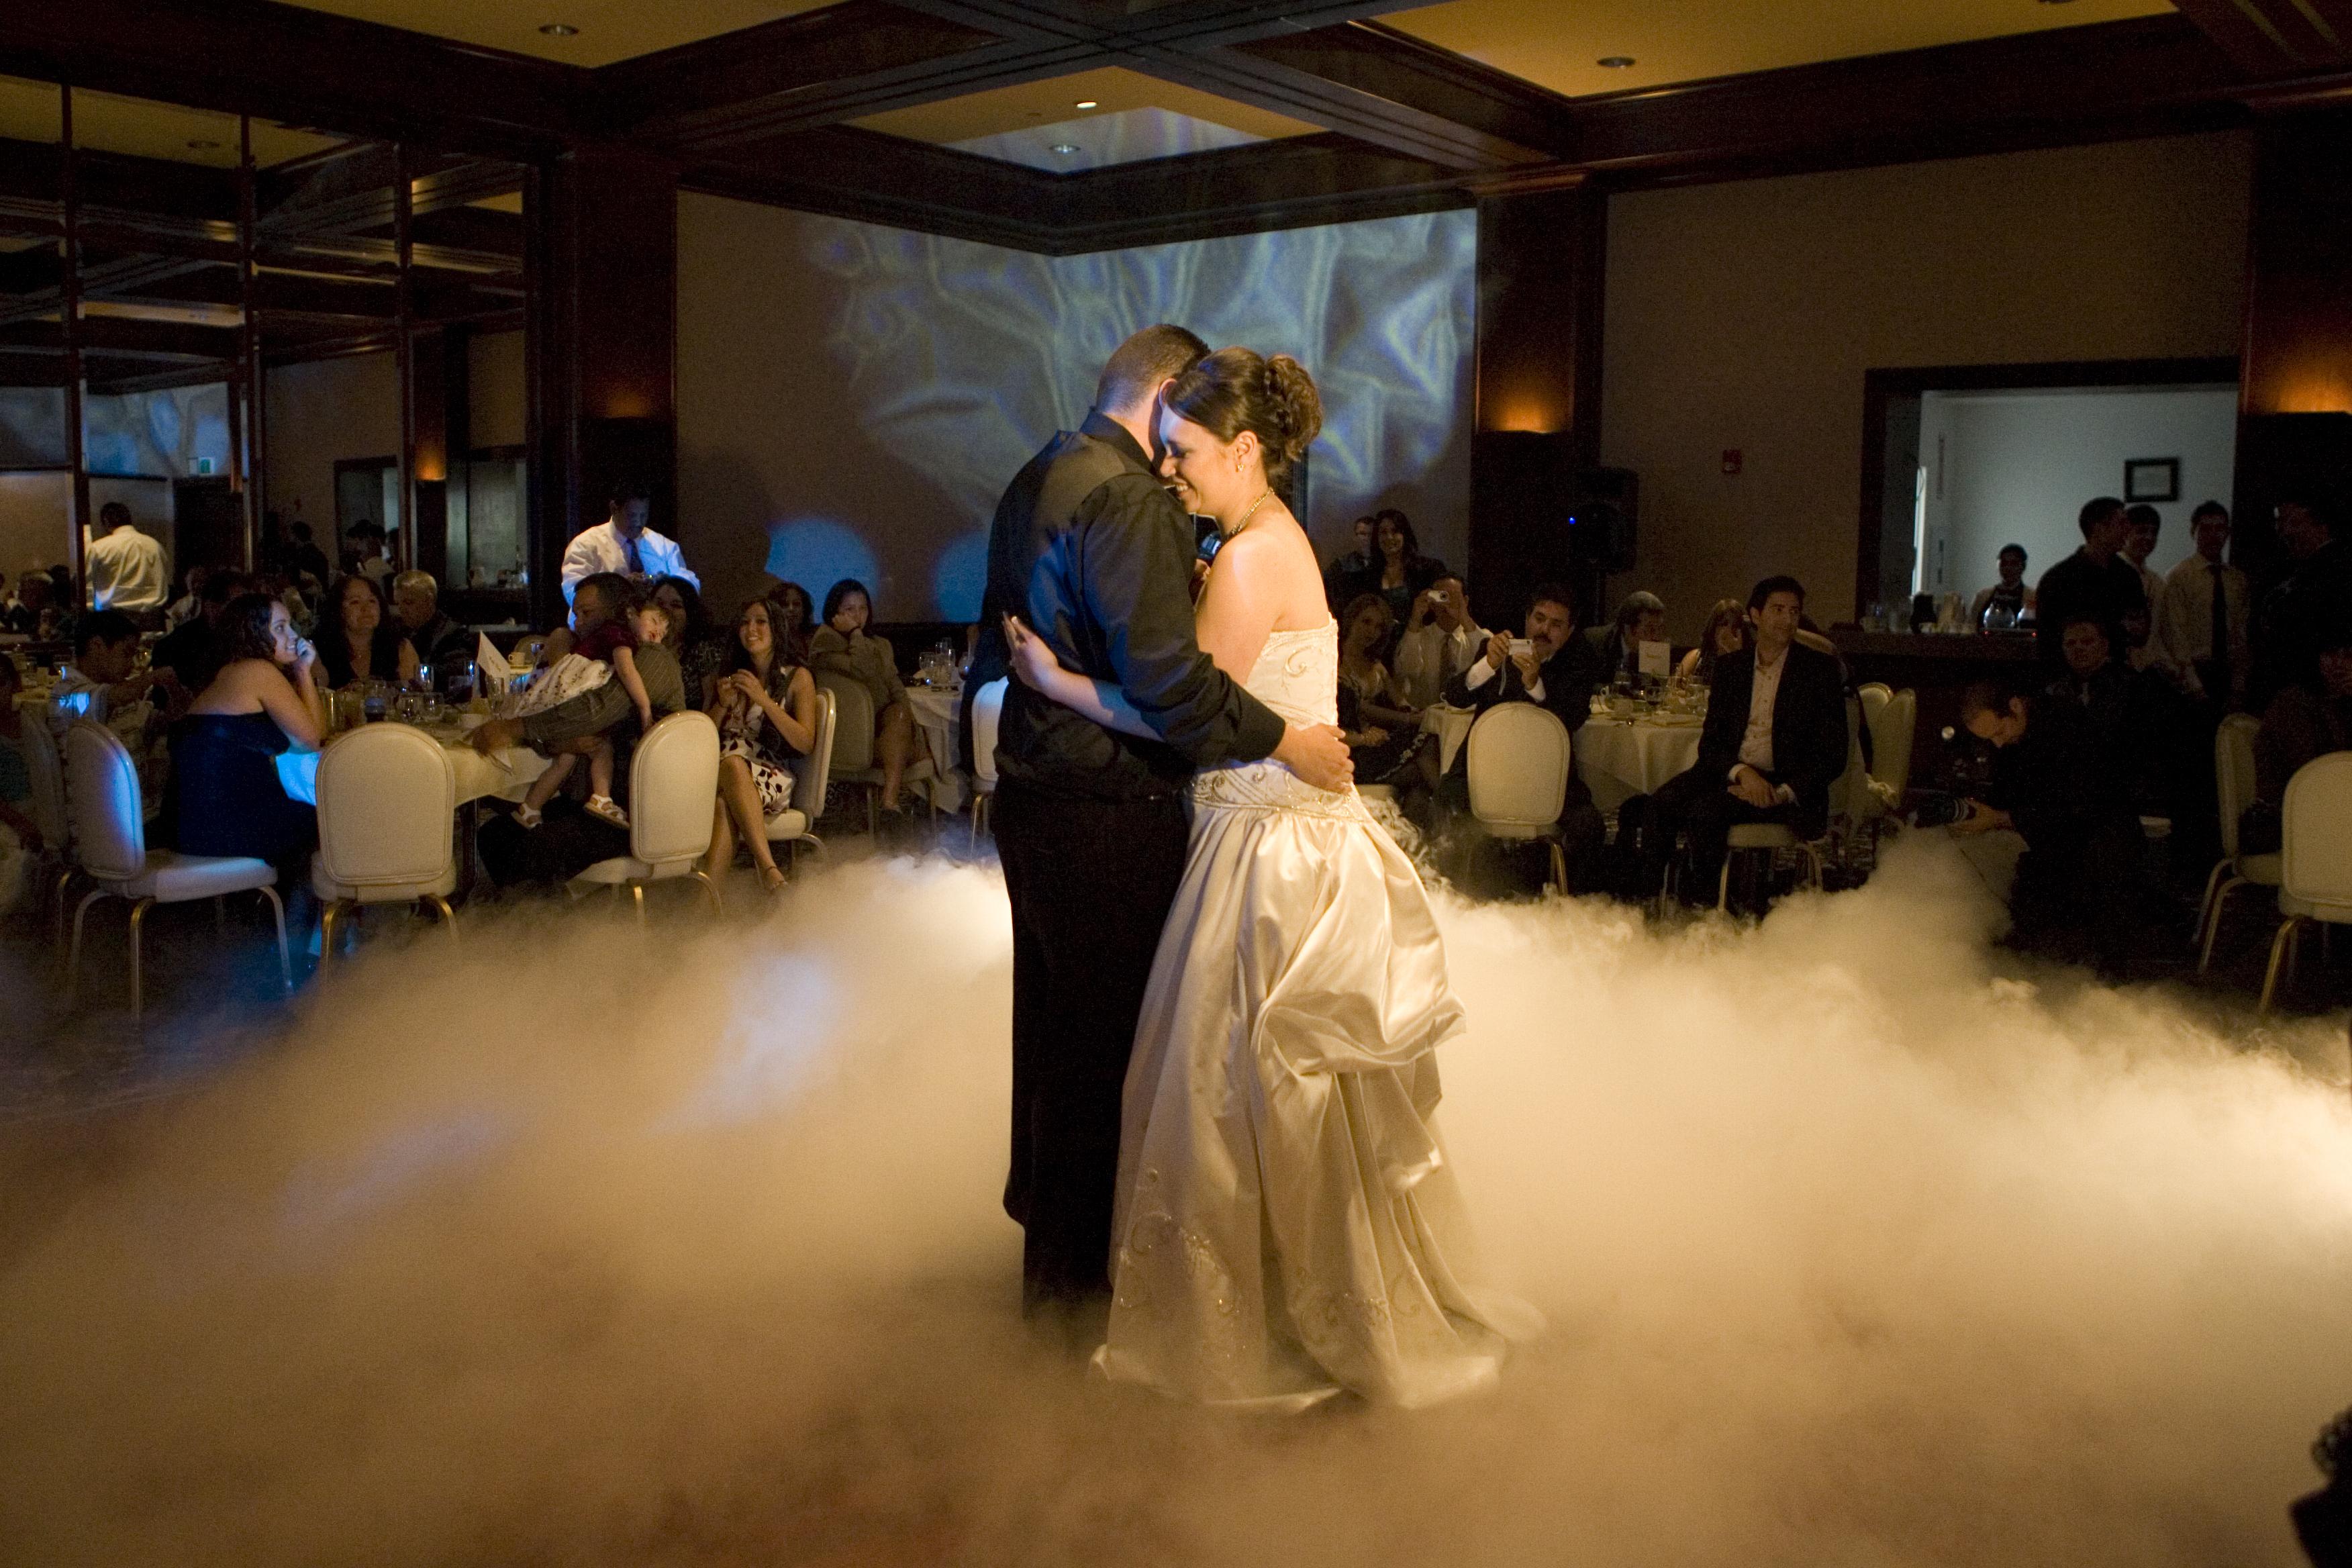 Dance On A Cloud - Image 2